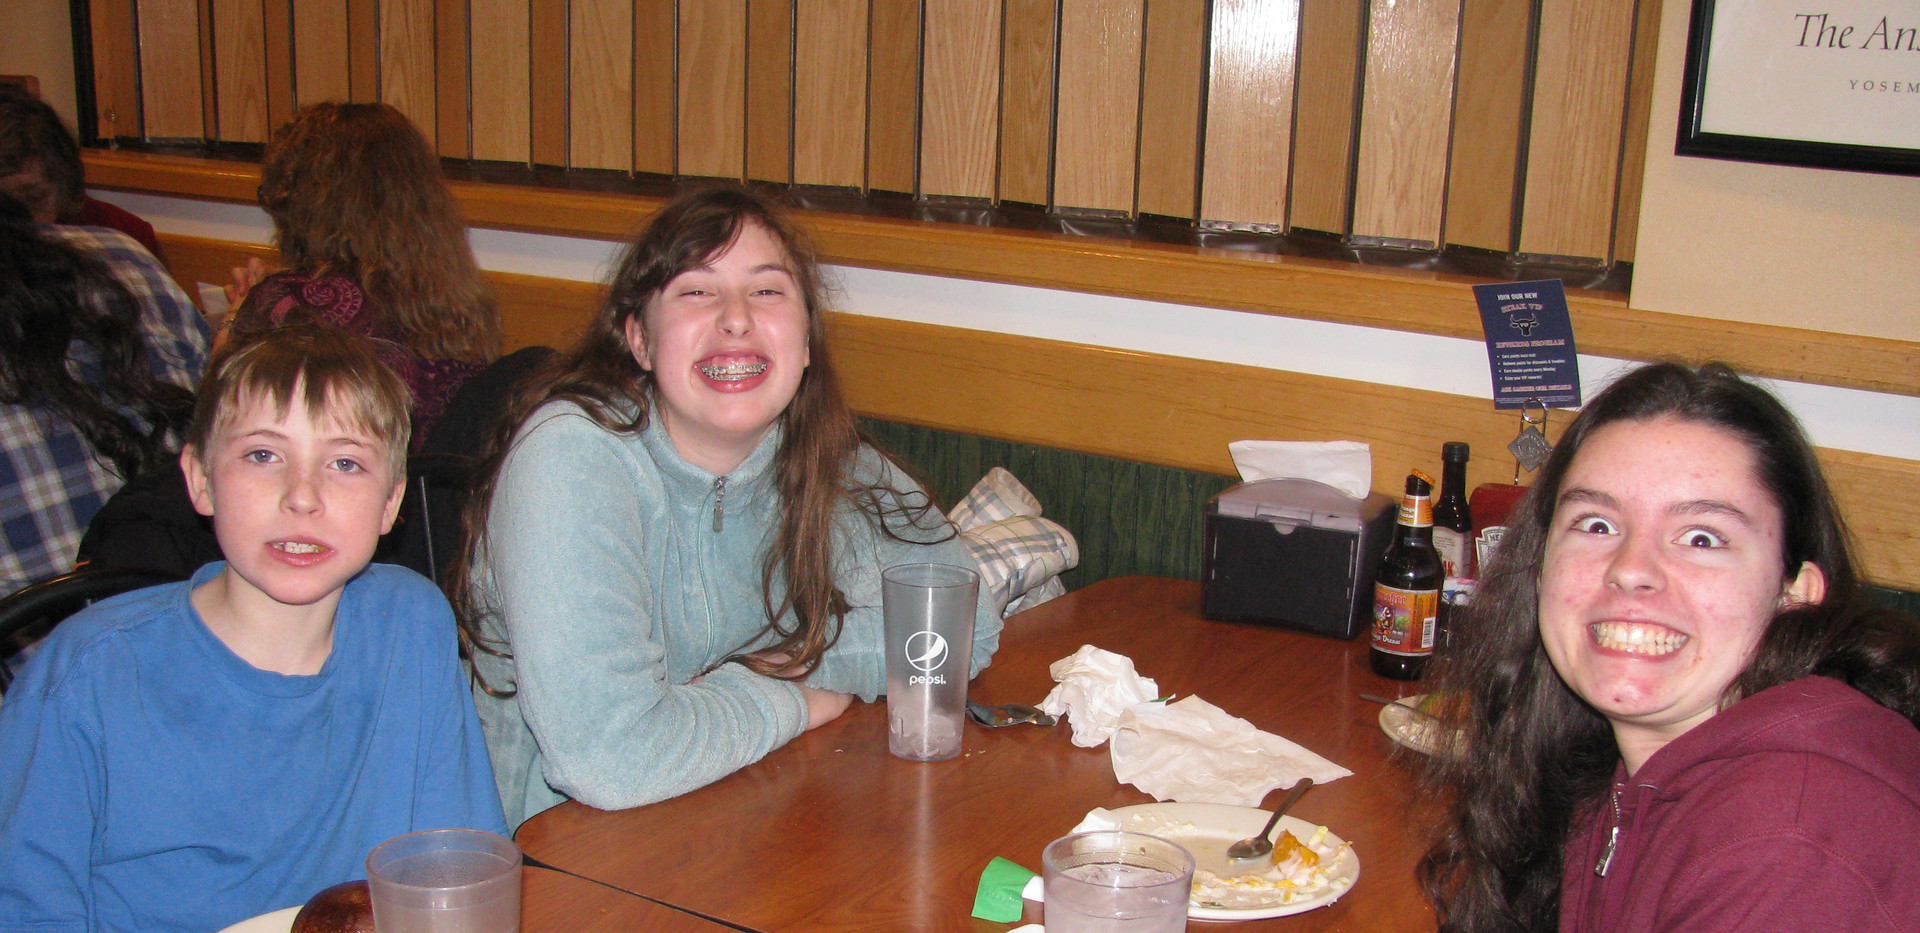 After church lunch at Hartford Ponderosa